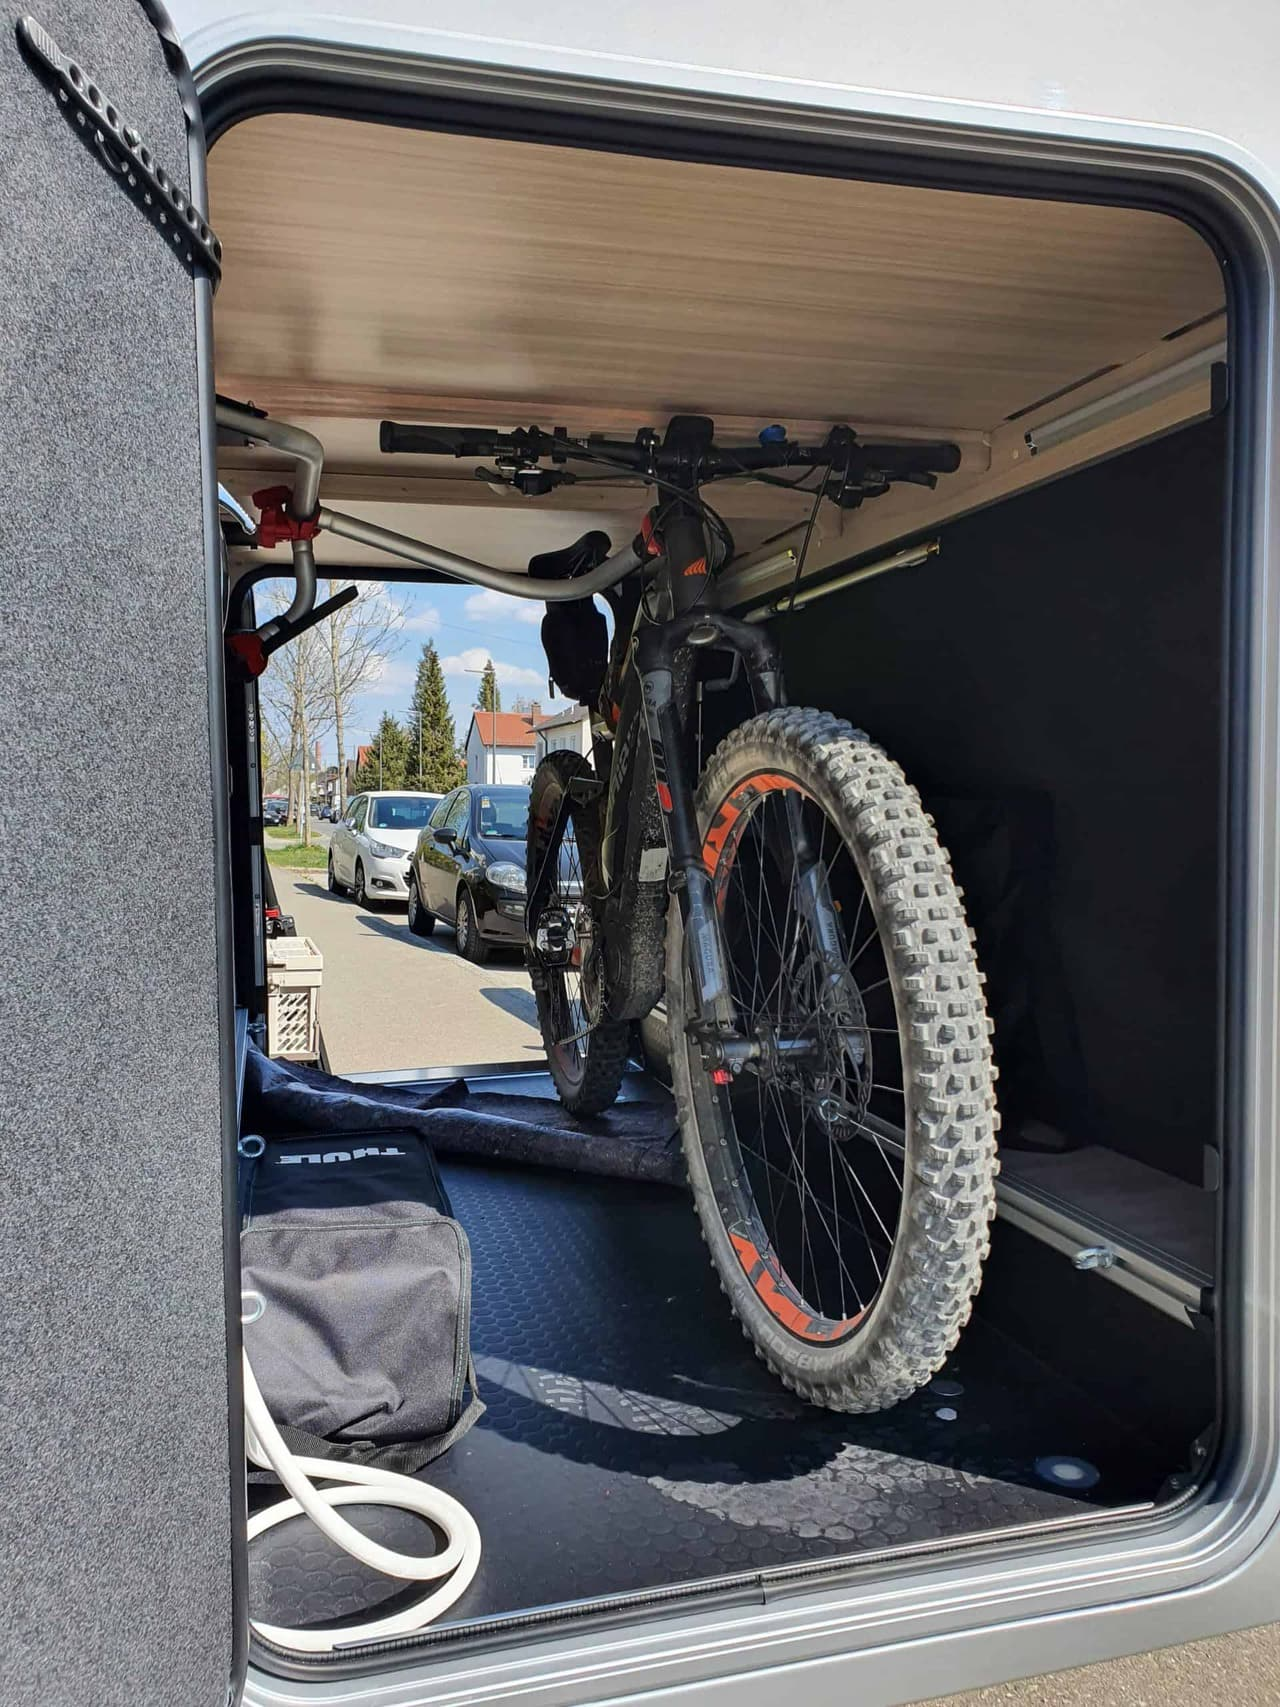 Rolands_Adria_Coral_Compact_Mountainbike_in_der_Garage_Front